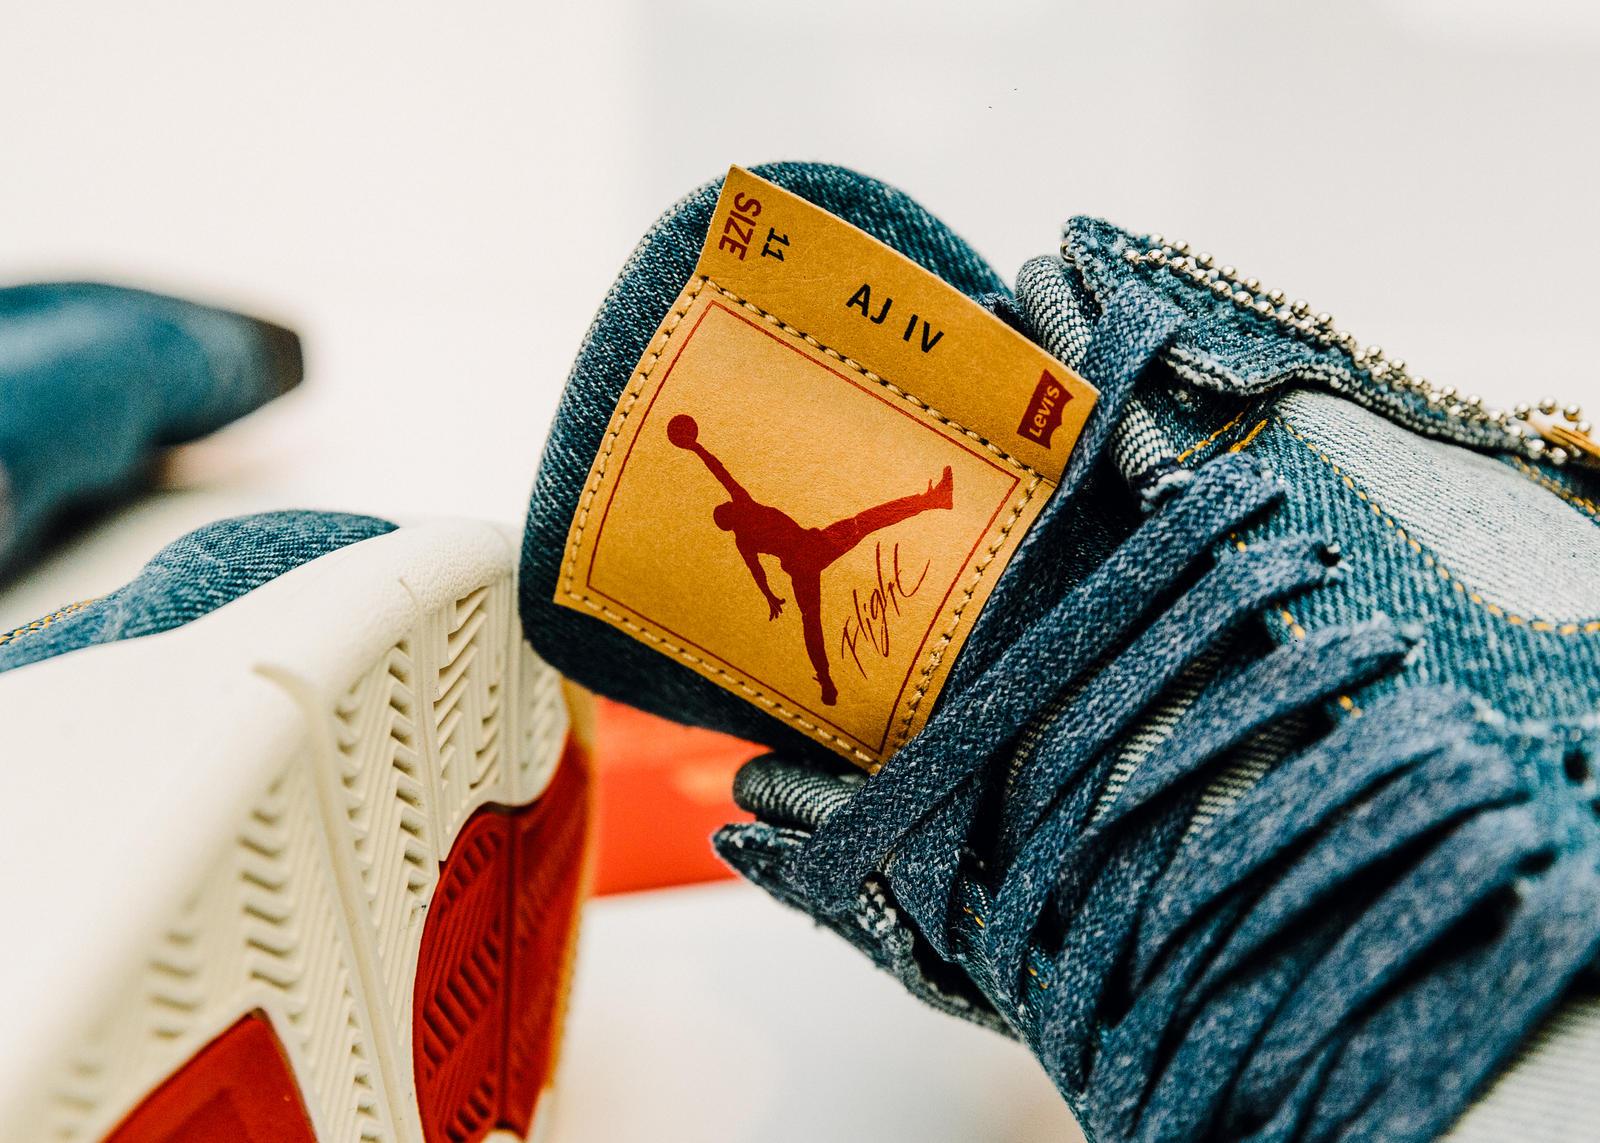 Significativo reparar Socialismo  Jordan Brand x Levi's® Air Jordan IV and Reversible Trucker Jacket - Nike  News